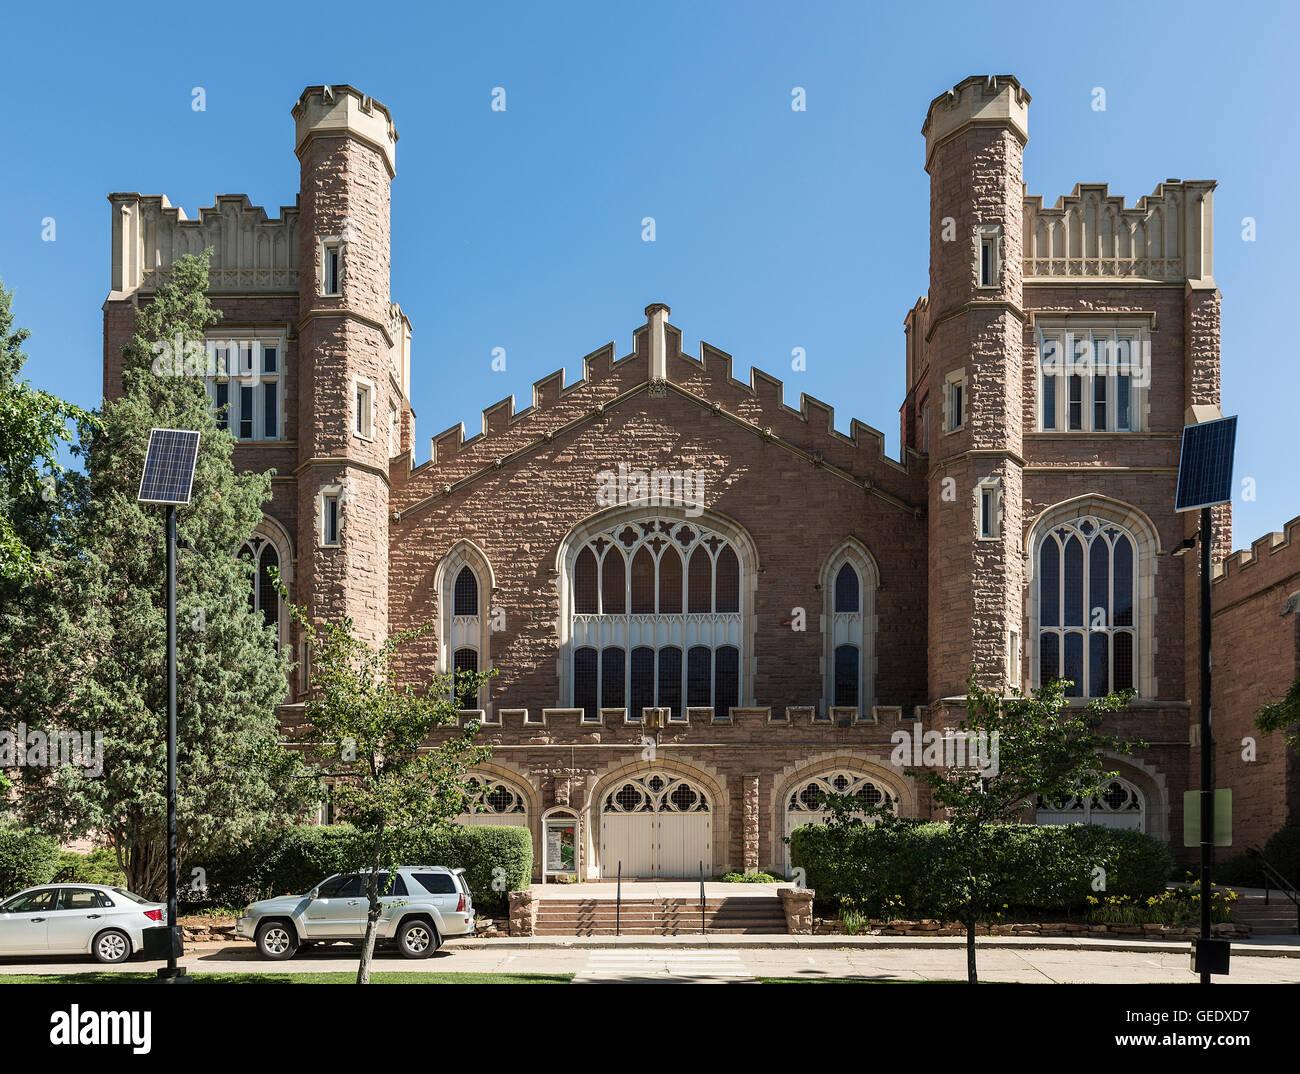 Macky Auditorium, University of Colorado, Boulder, Colorado, USA. - Stock Image